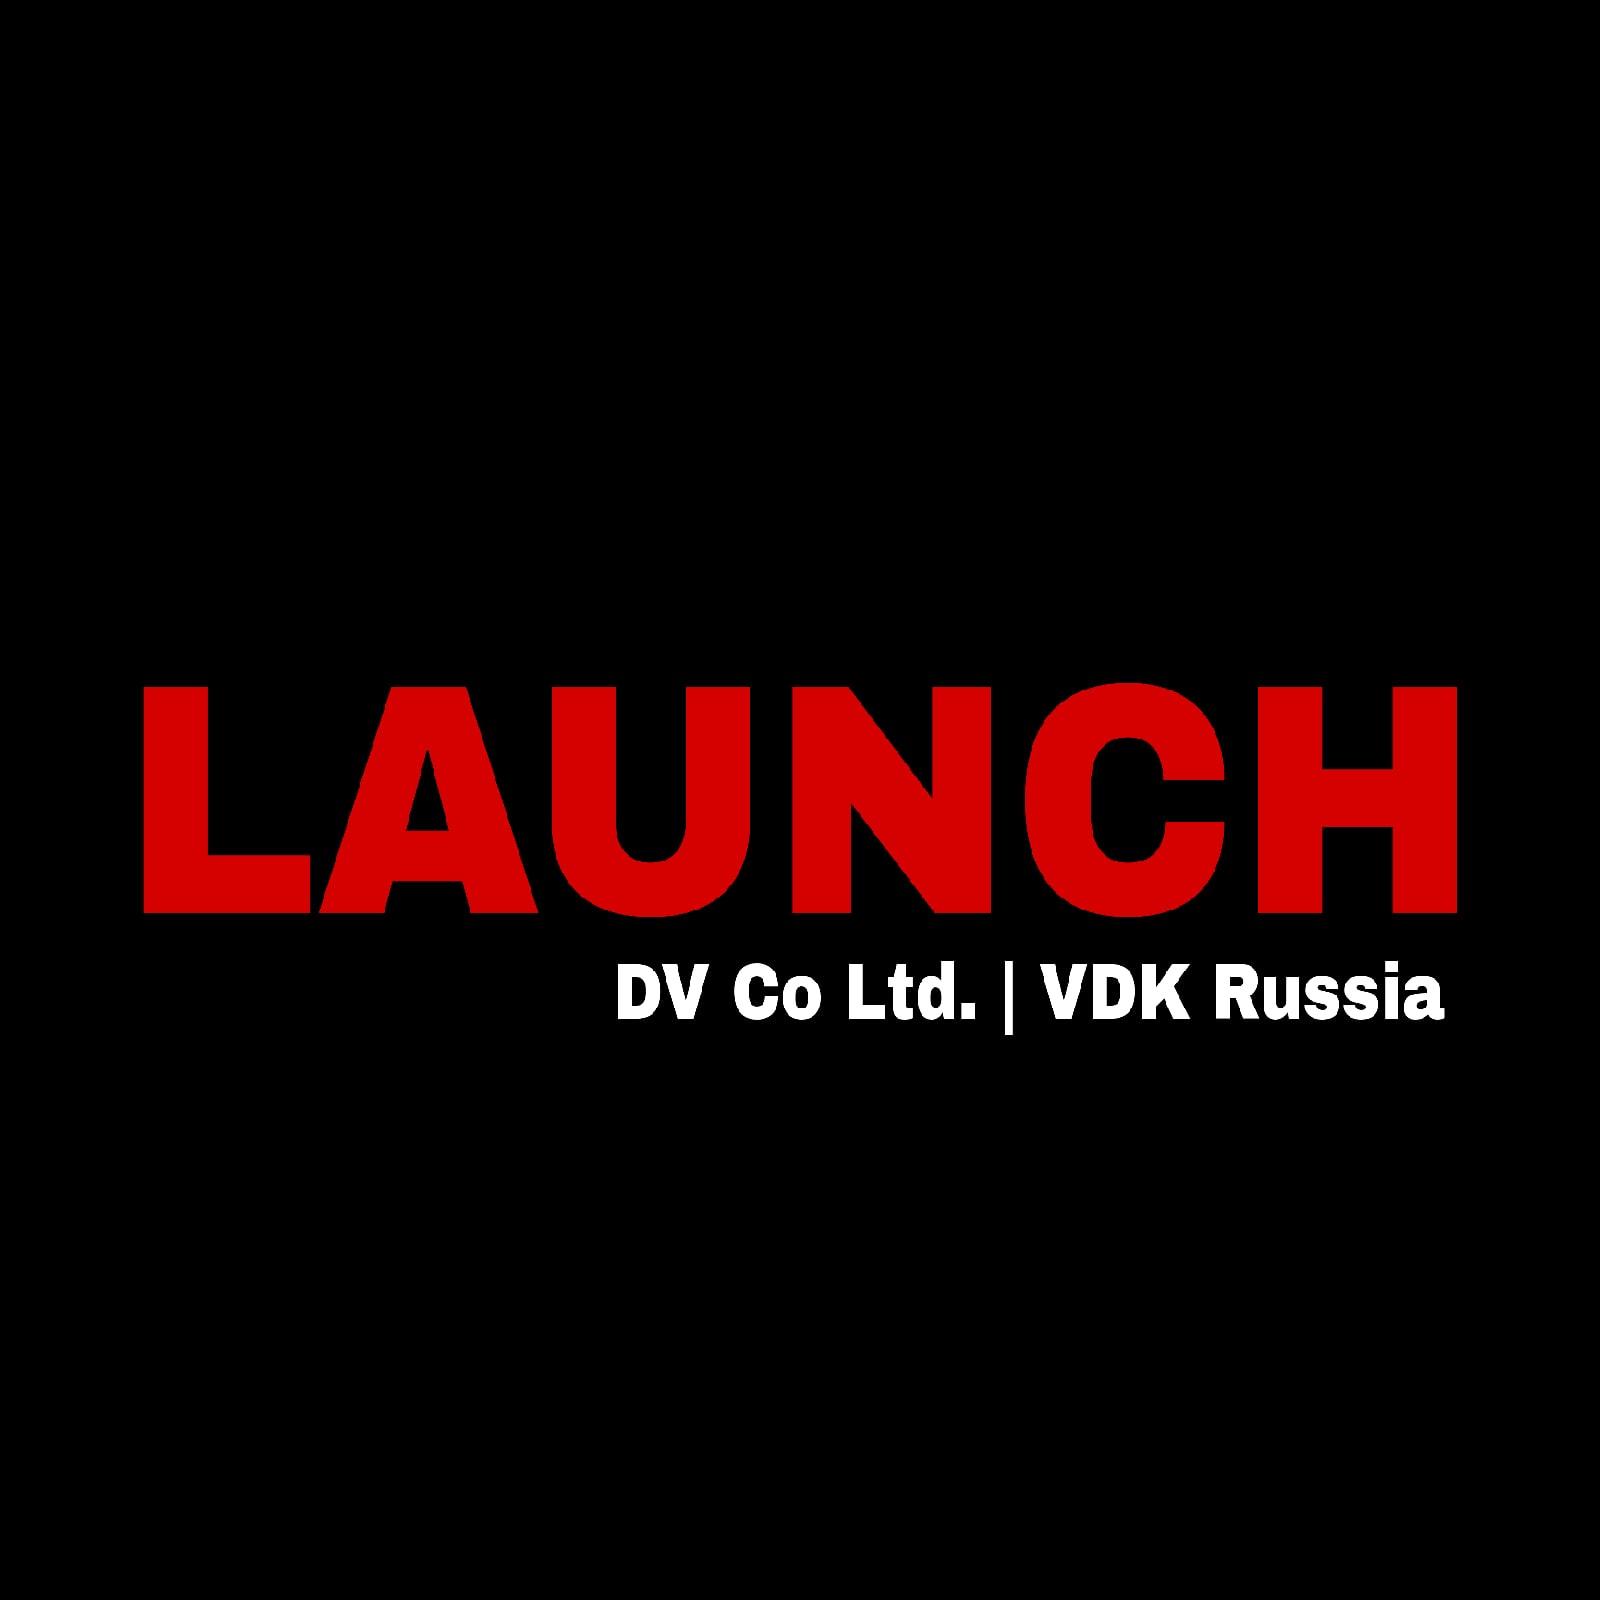 launch.dv